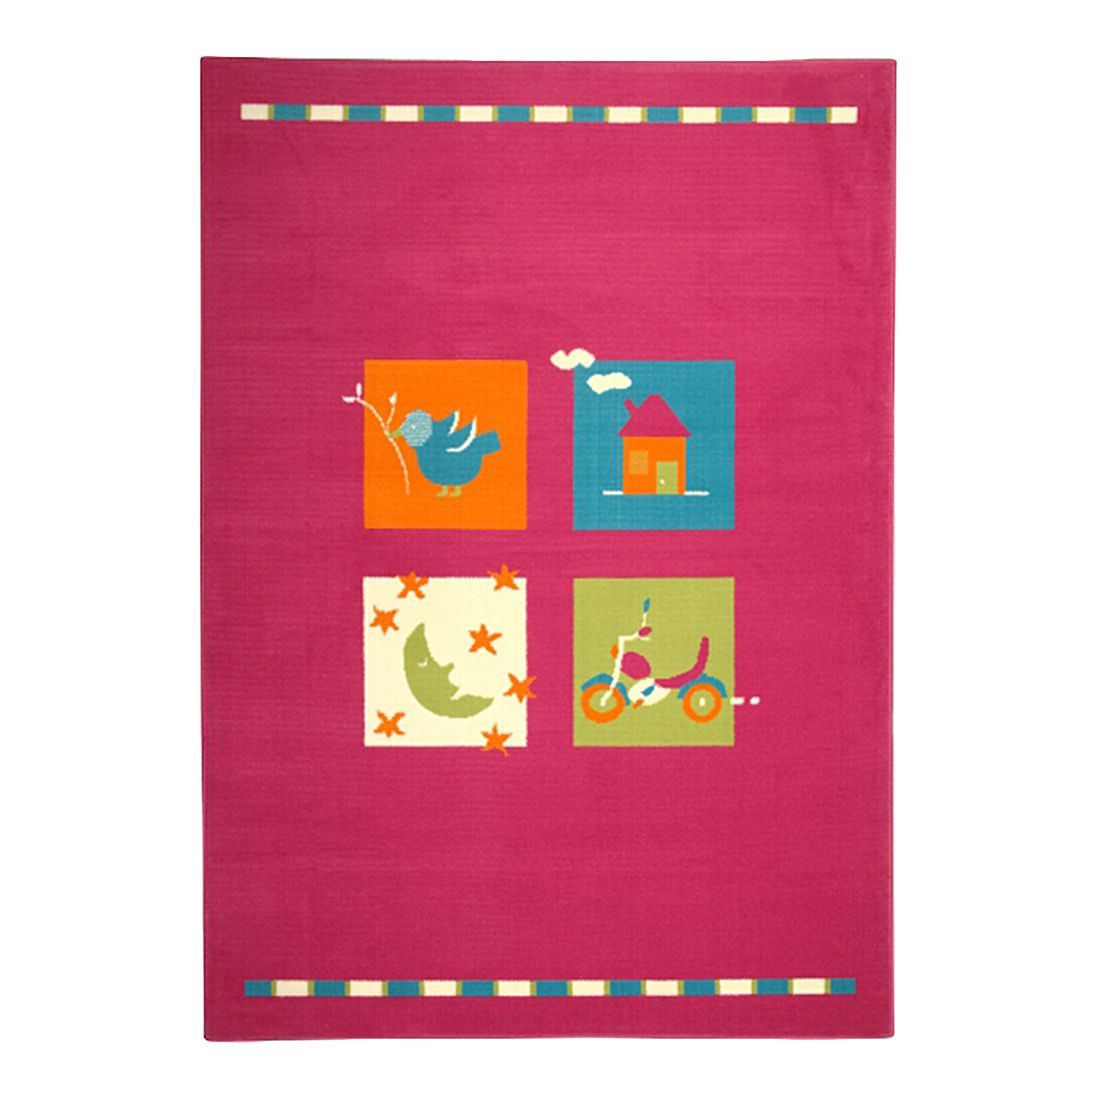 Teppich Luna Kids 550516 – Pink – 225 x 160 cm, KC-Handel online bestellen